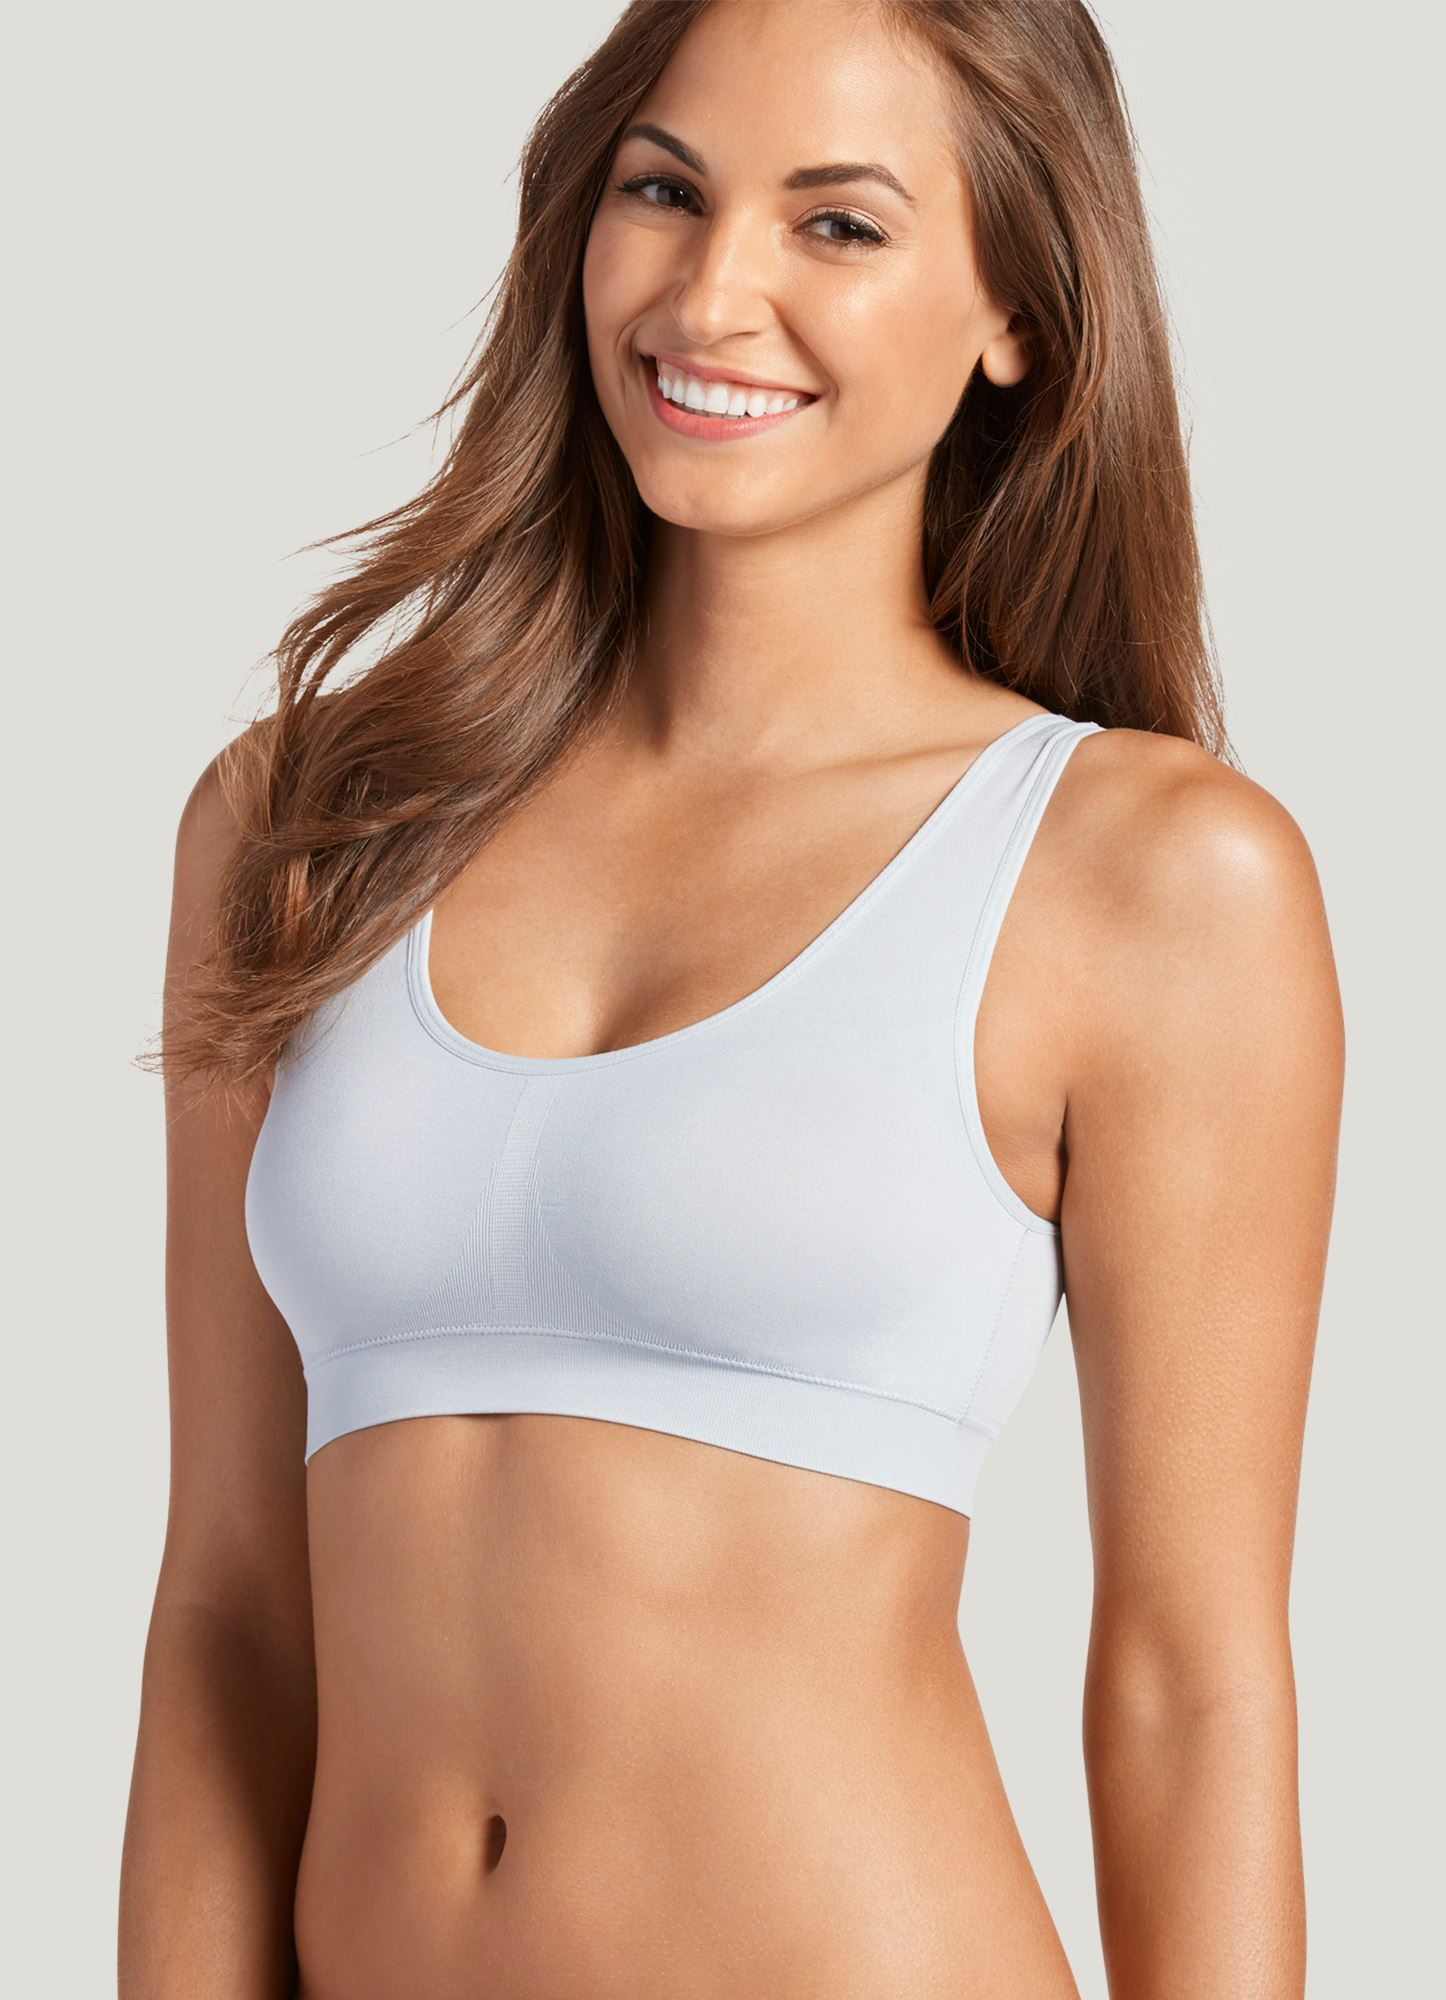 06aaccebf2ff91 Jockey Women s T-Shirts Modern Micro Seamfree Cami Strap Bralette at Amazon  Women s Clothing store